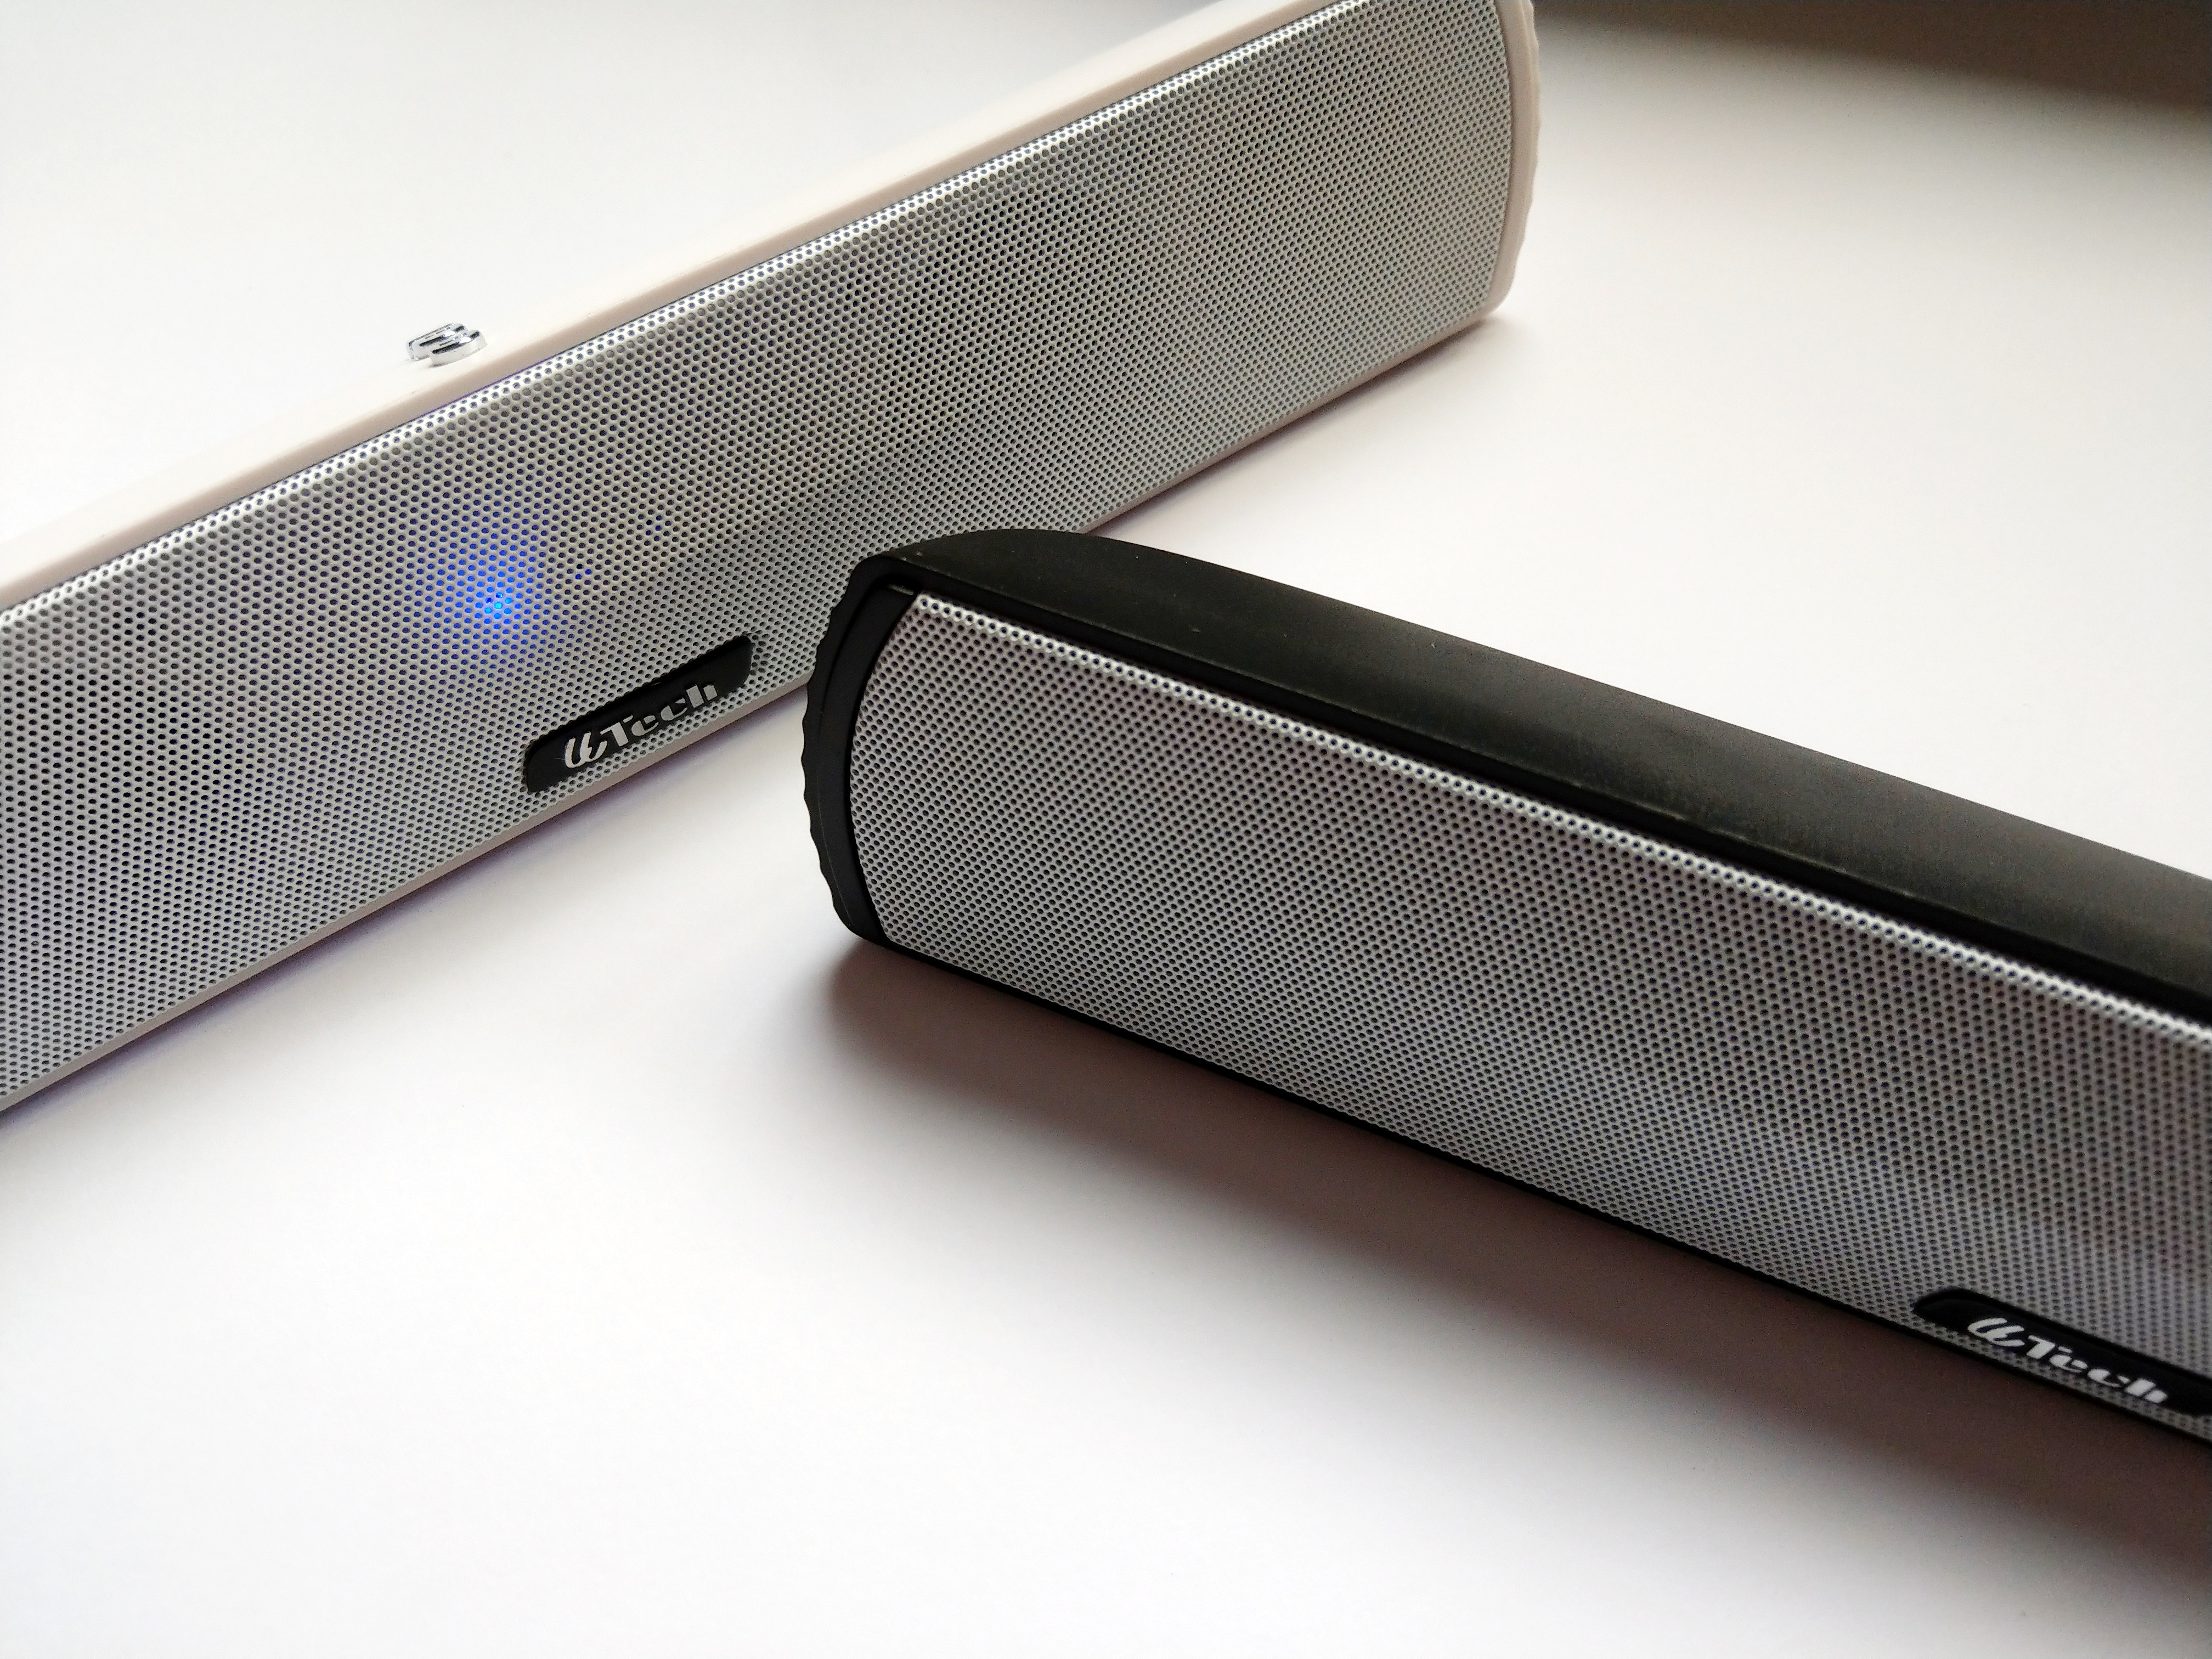 Utech 無線藍芽重低音智慧型音箱 - utech, 低音, 喇叭, 無線, 藍芽, 音箱 - 科技生活 - teXch